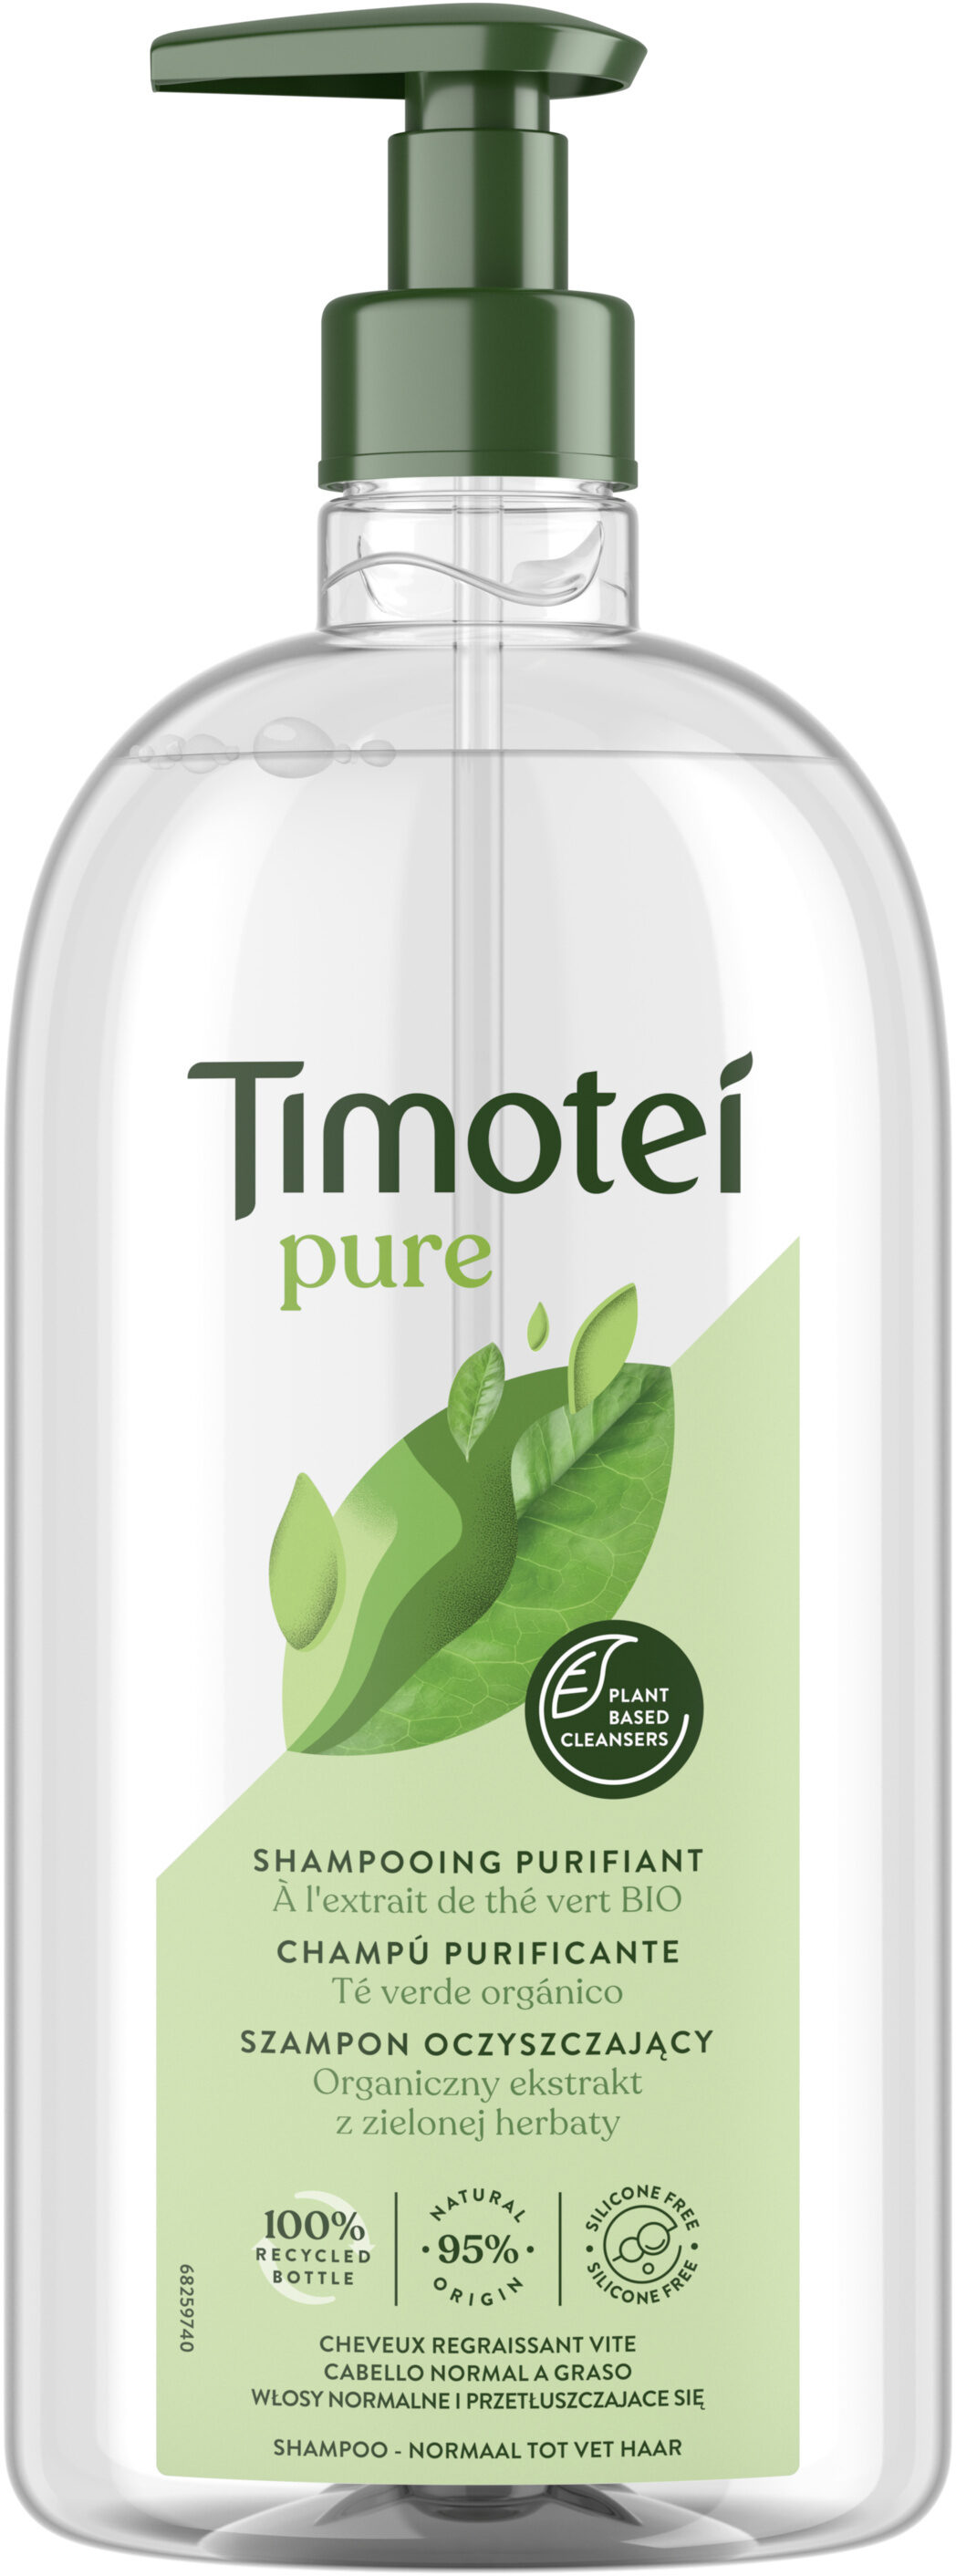 Timotei Shampooing Femme Pure - Produit - fr